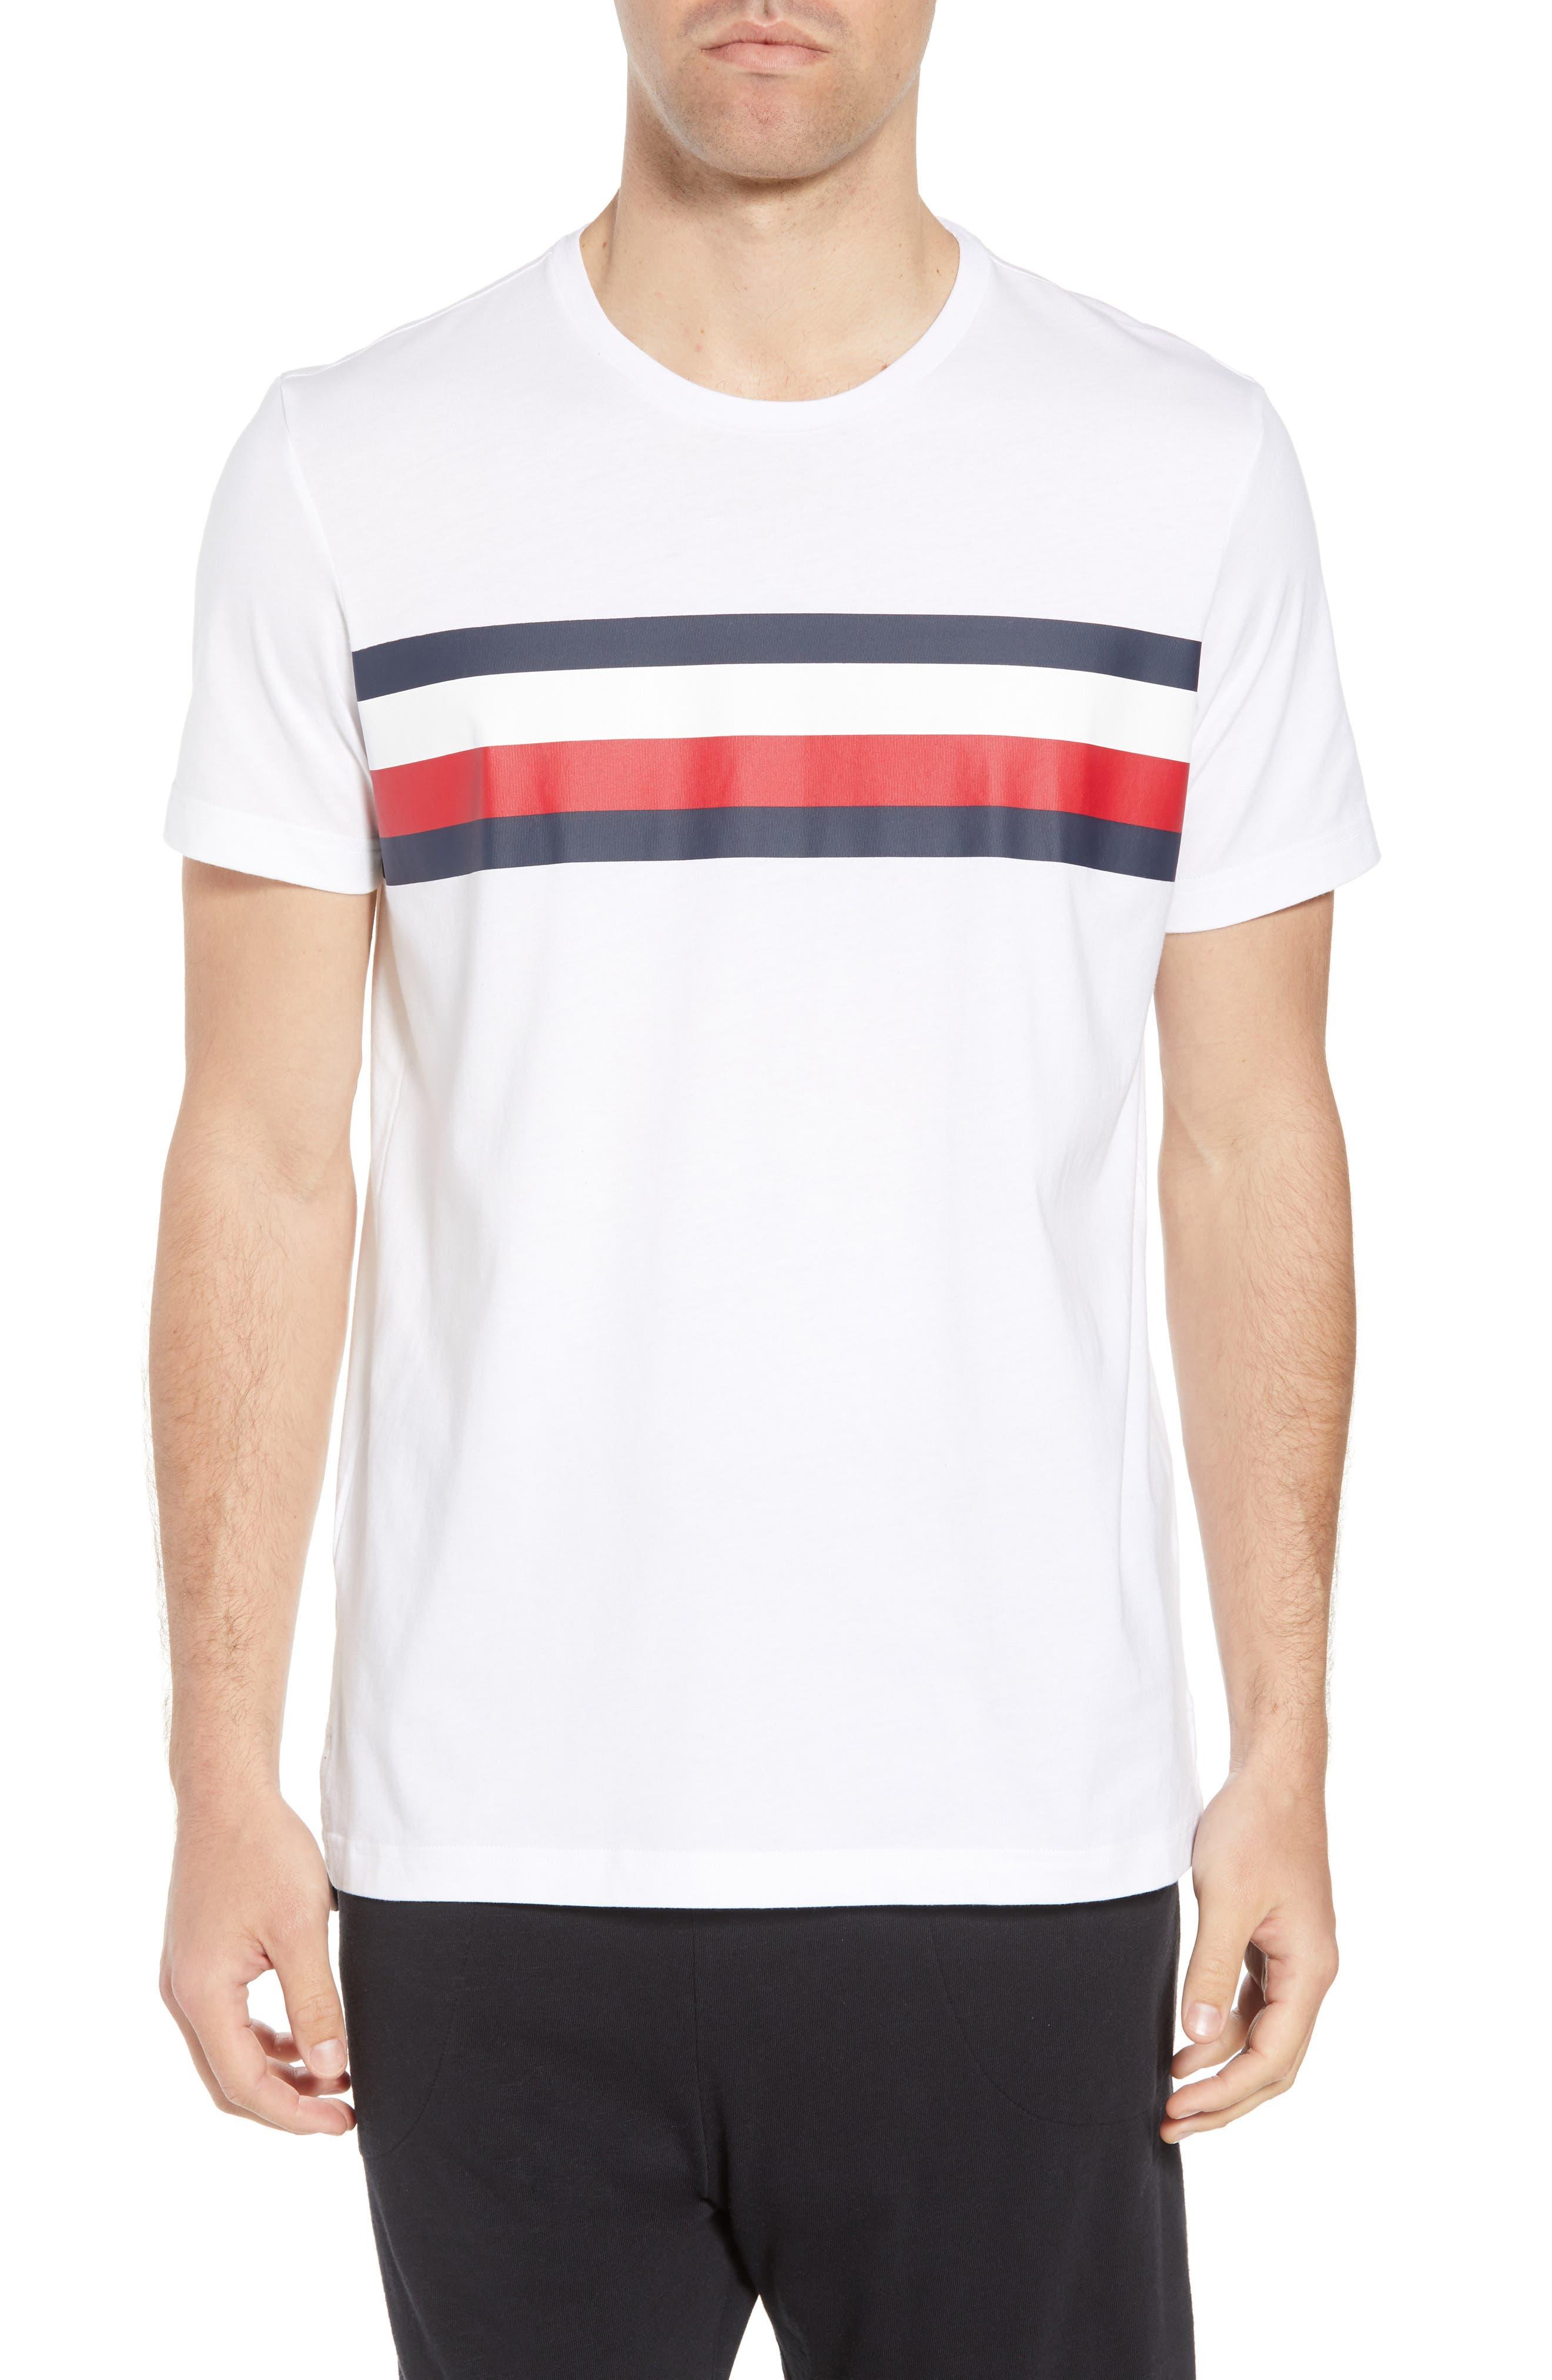 Tommy Hilfiger 1985 Stripe T-Shirt